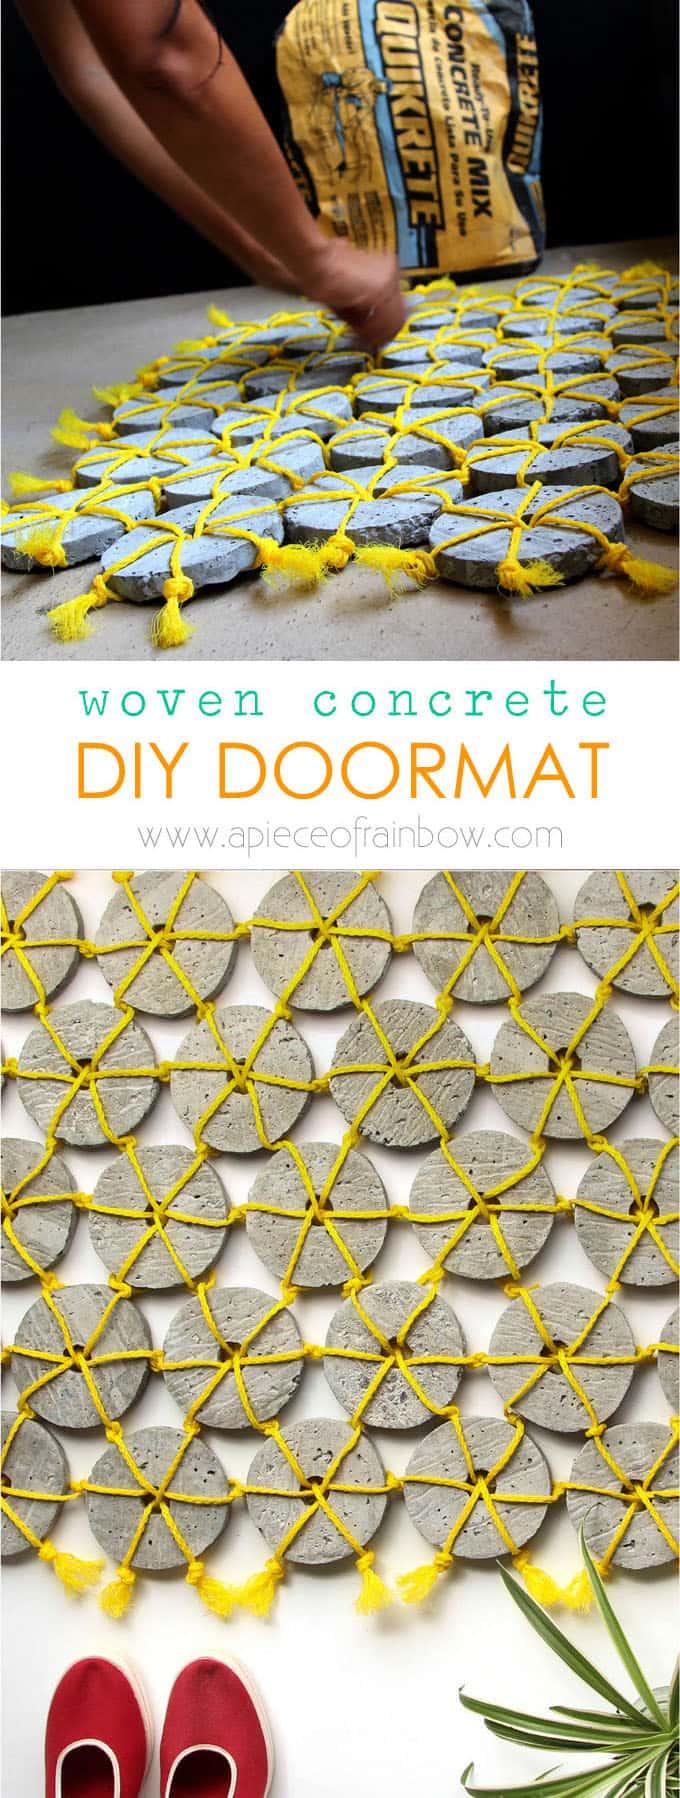 DIY-woven-concrete-doormat-apieceofrainbow (5)